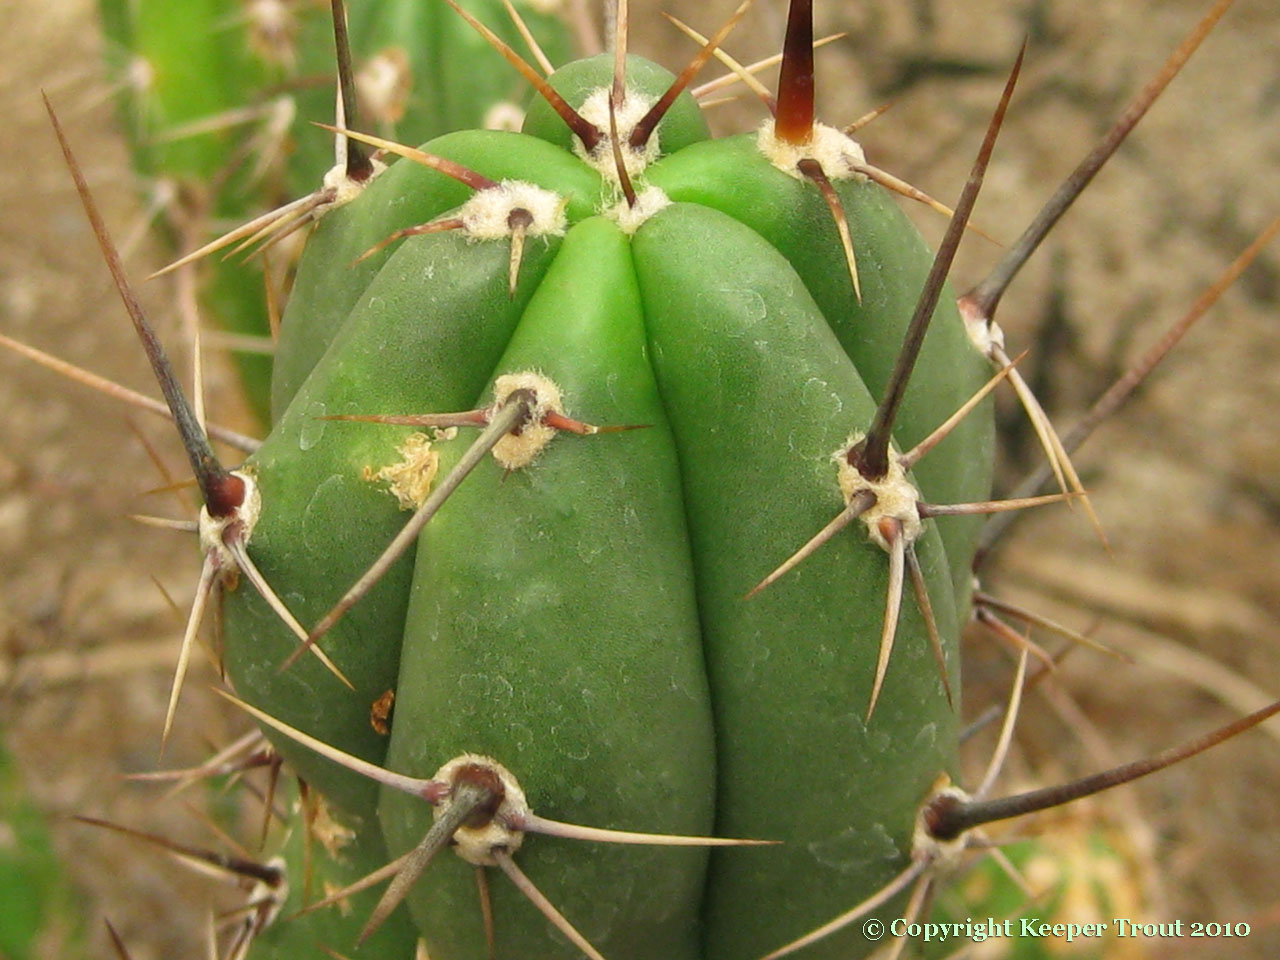 Trichocereus-macrogonus-KK923-NMCR_2010